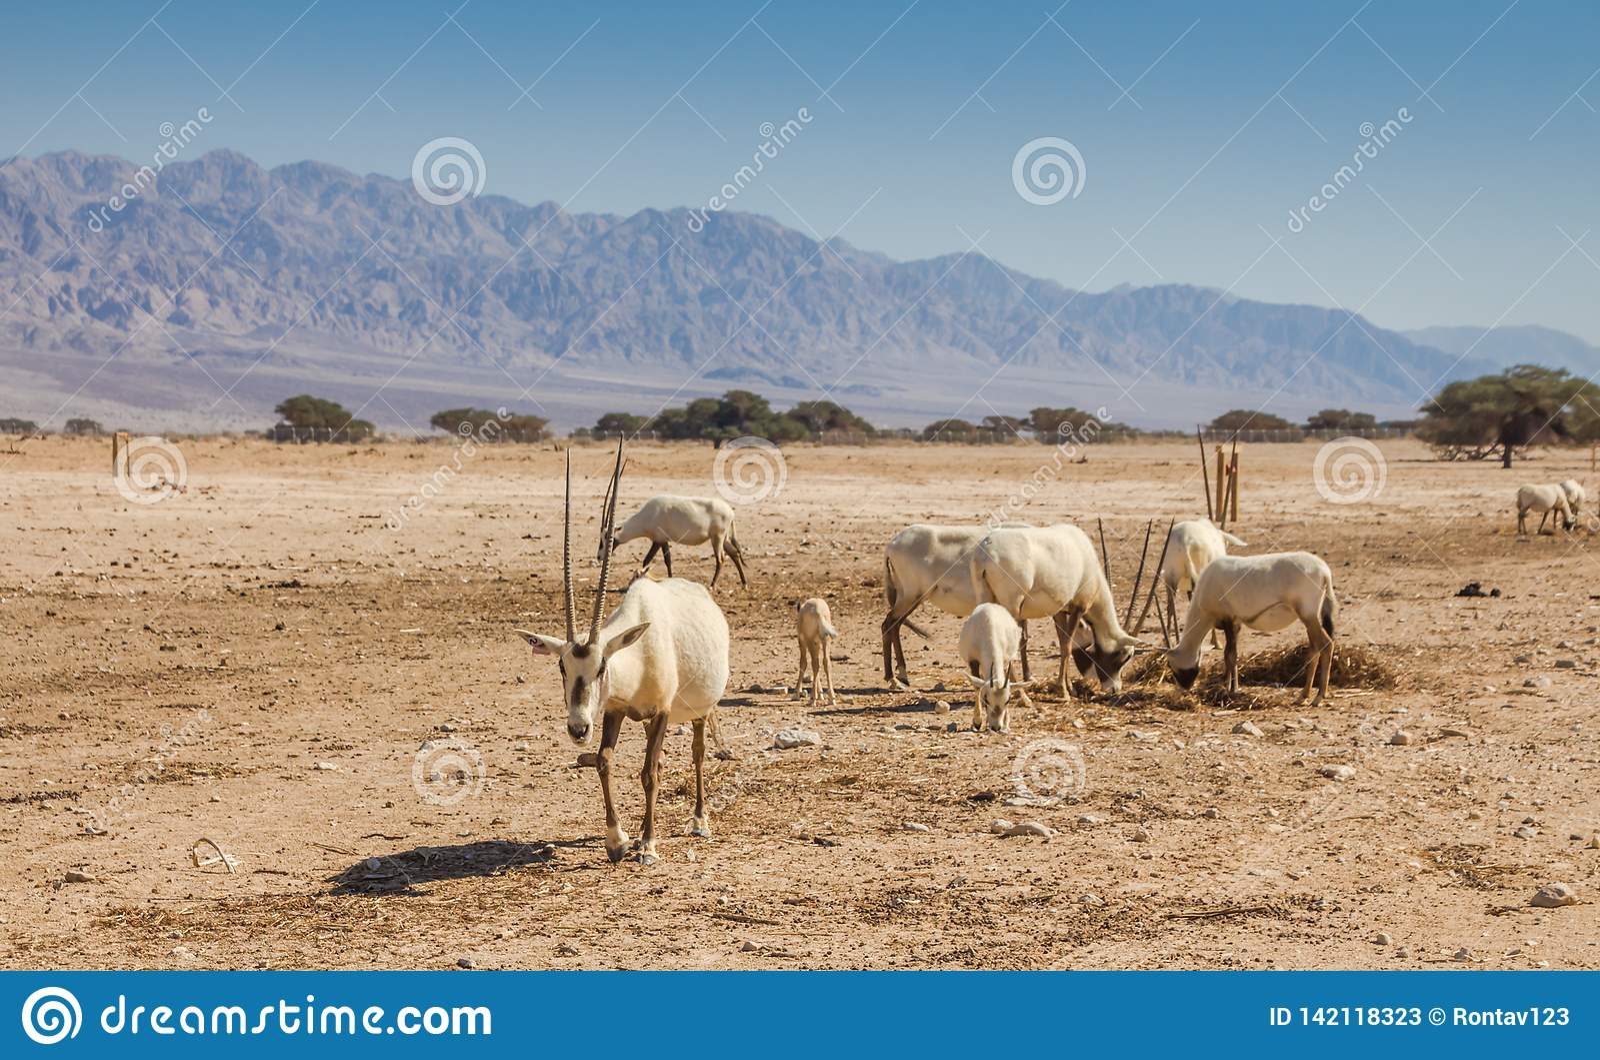 Arabian Oryx Oryx leucoryx a genus of Antelope species, an endangered animal in the `Hay-Bar` Yotvata Nature Reserve Israel